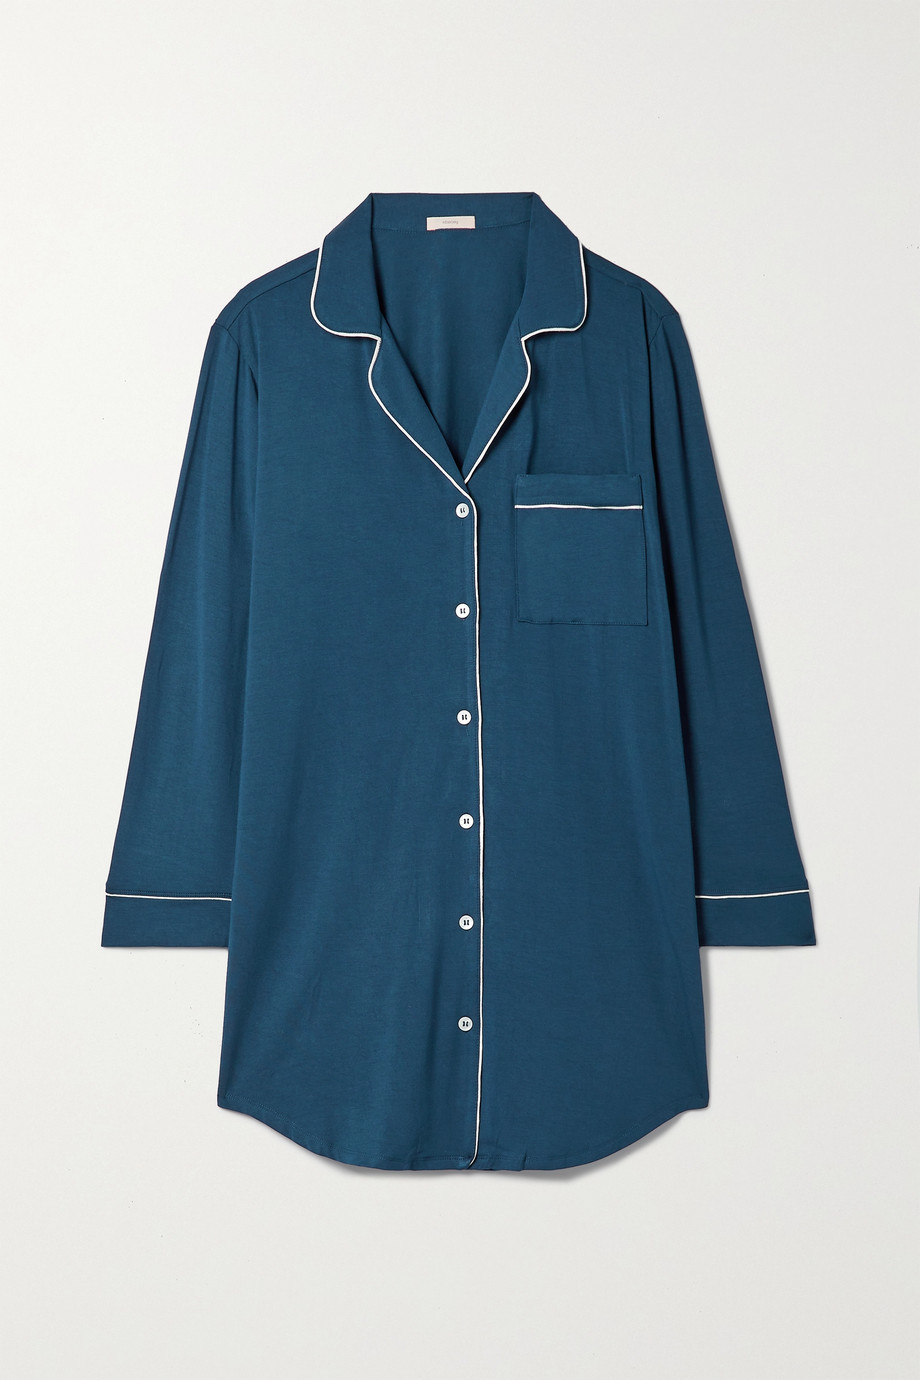 Eberjey Gisele stretch-modal nightdress